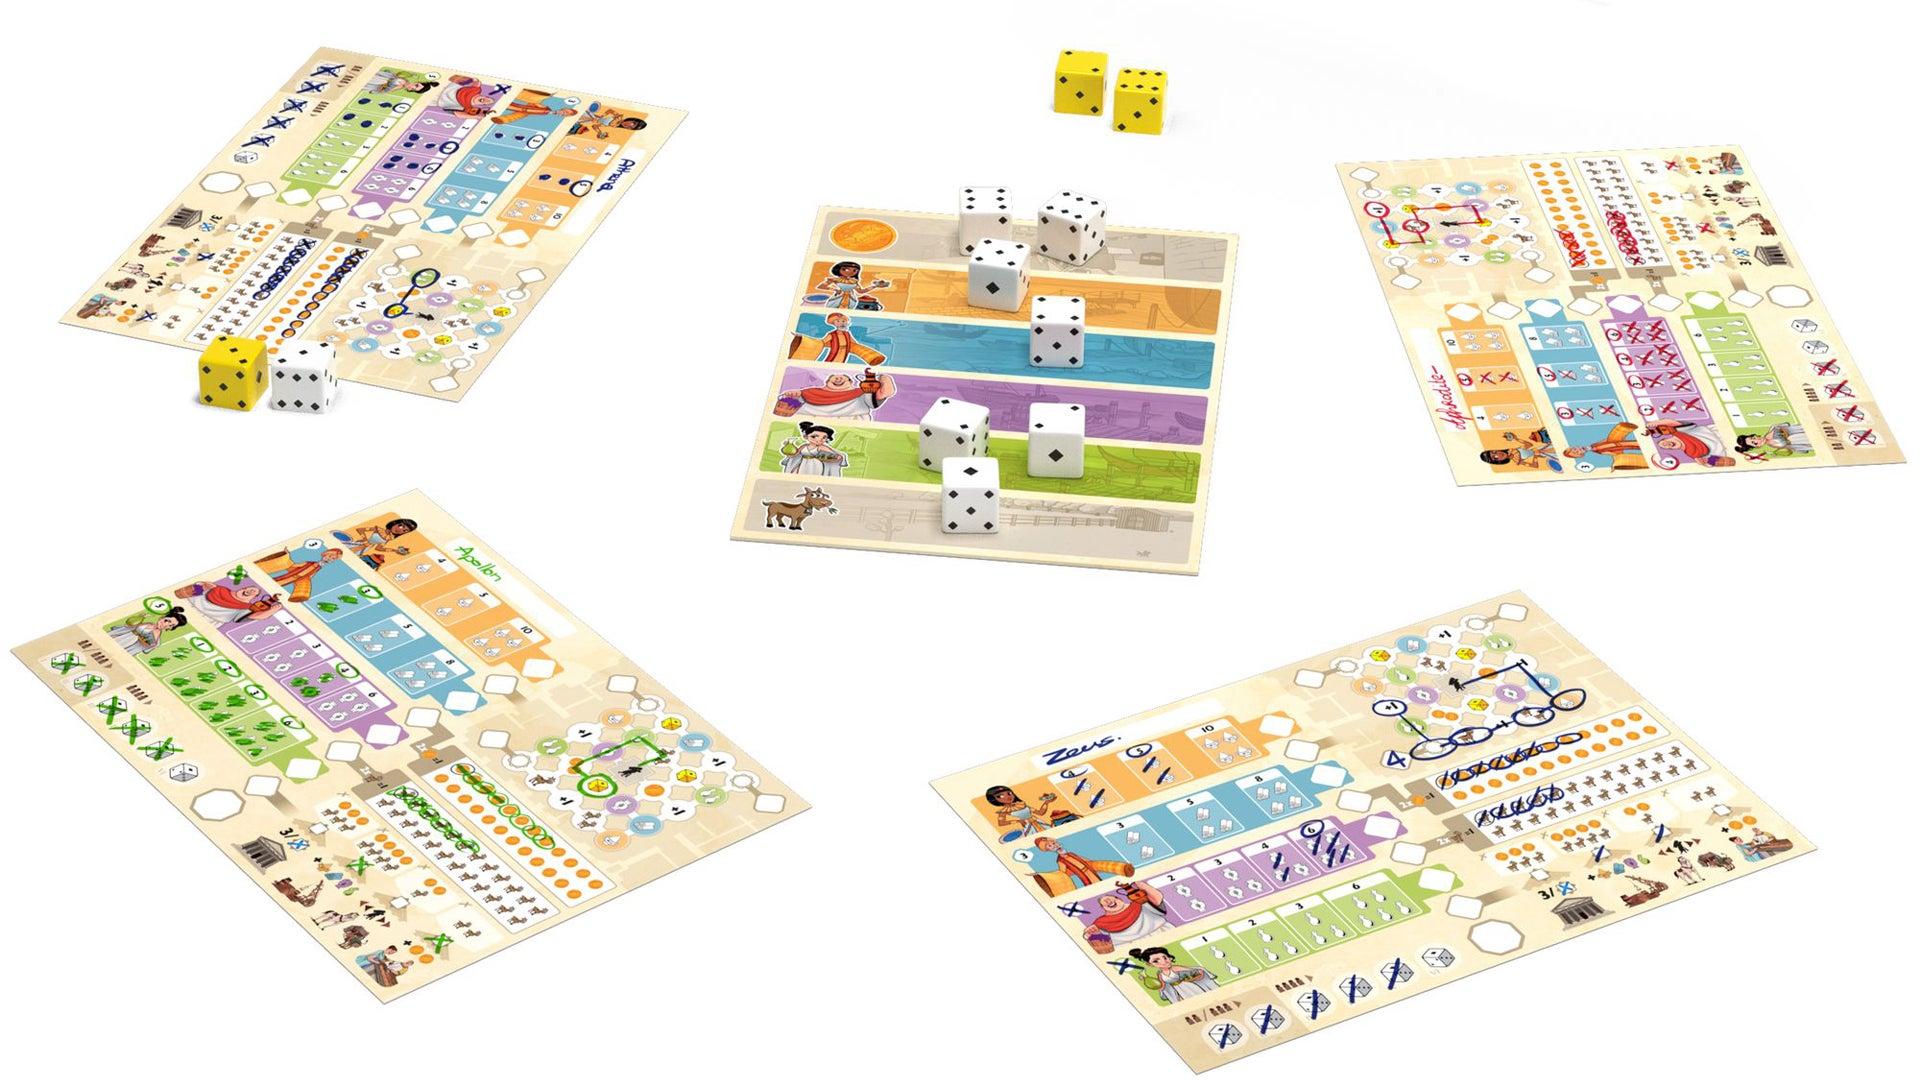 corinth-board-game-gameplay-layout.jpg